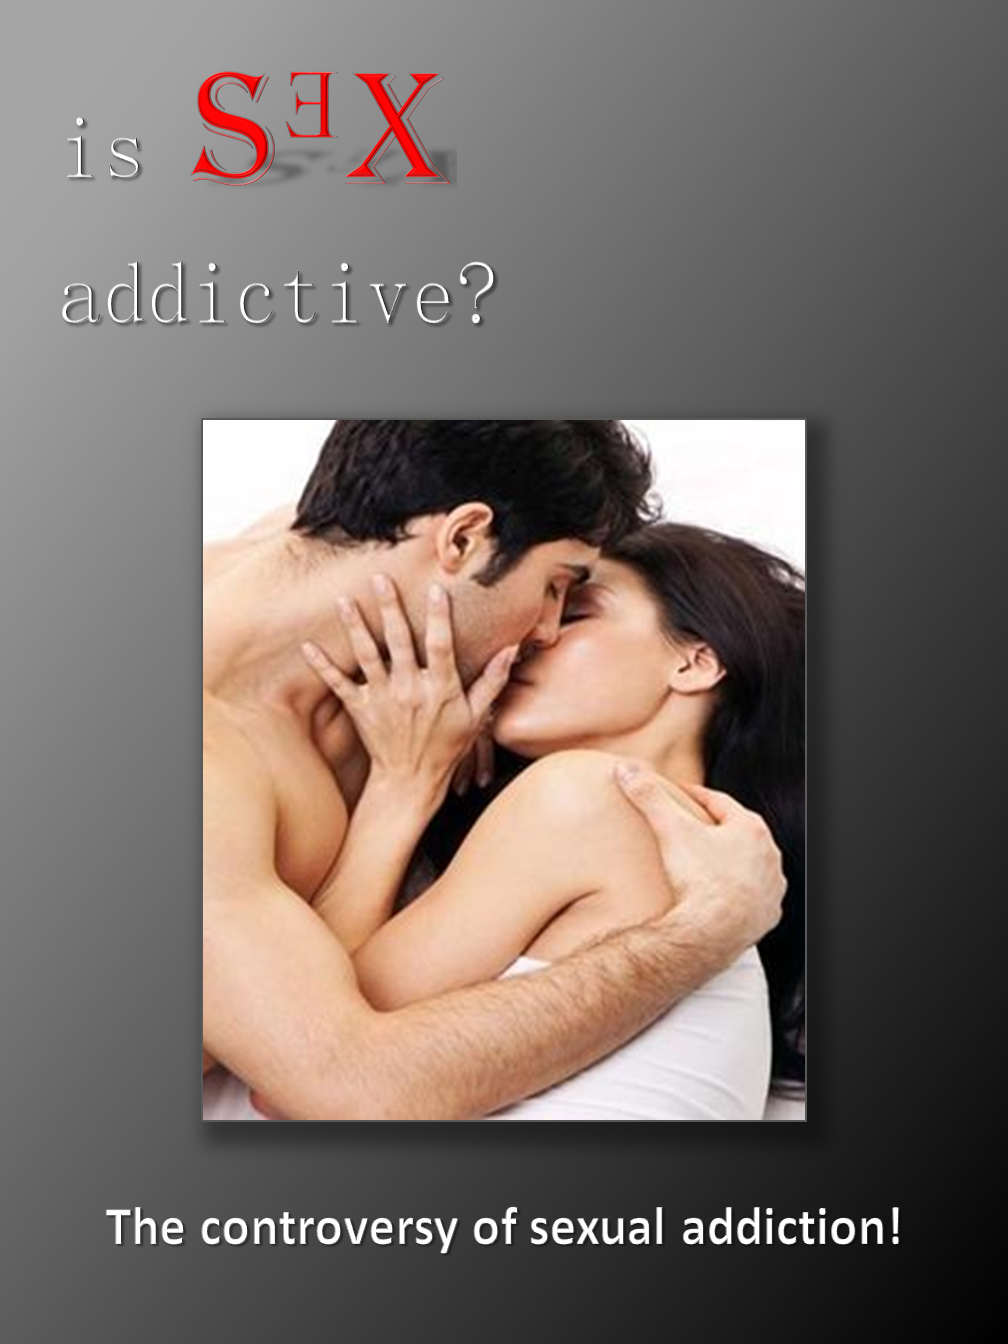 Is SEX addictive?